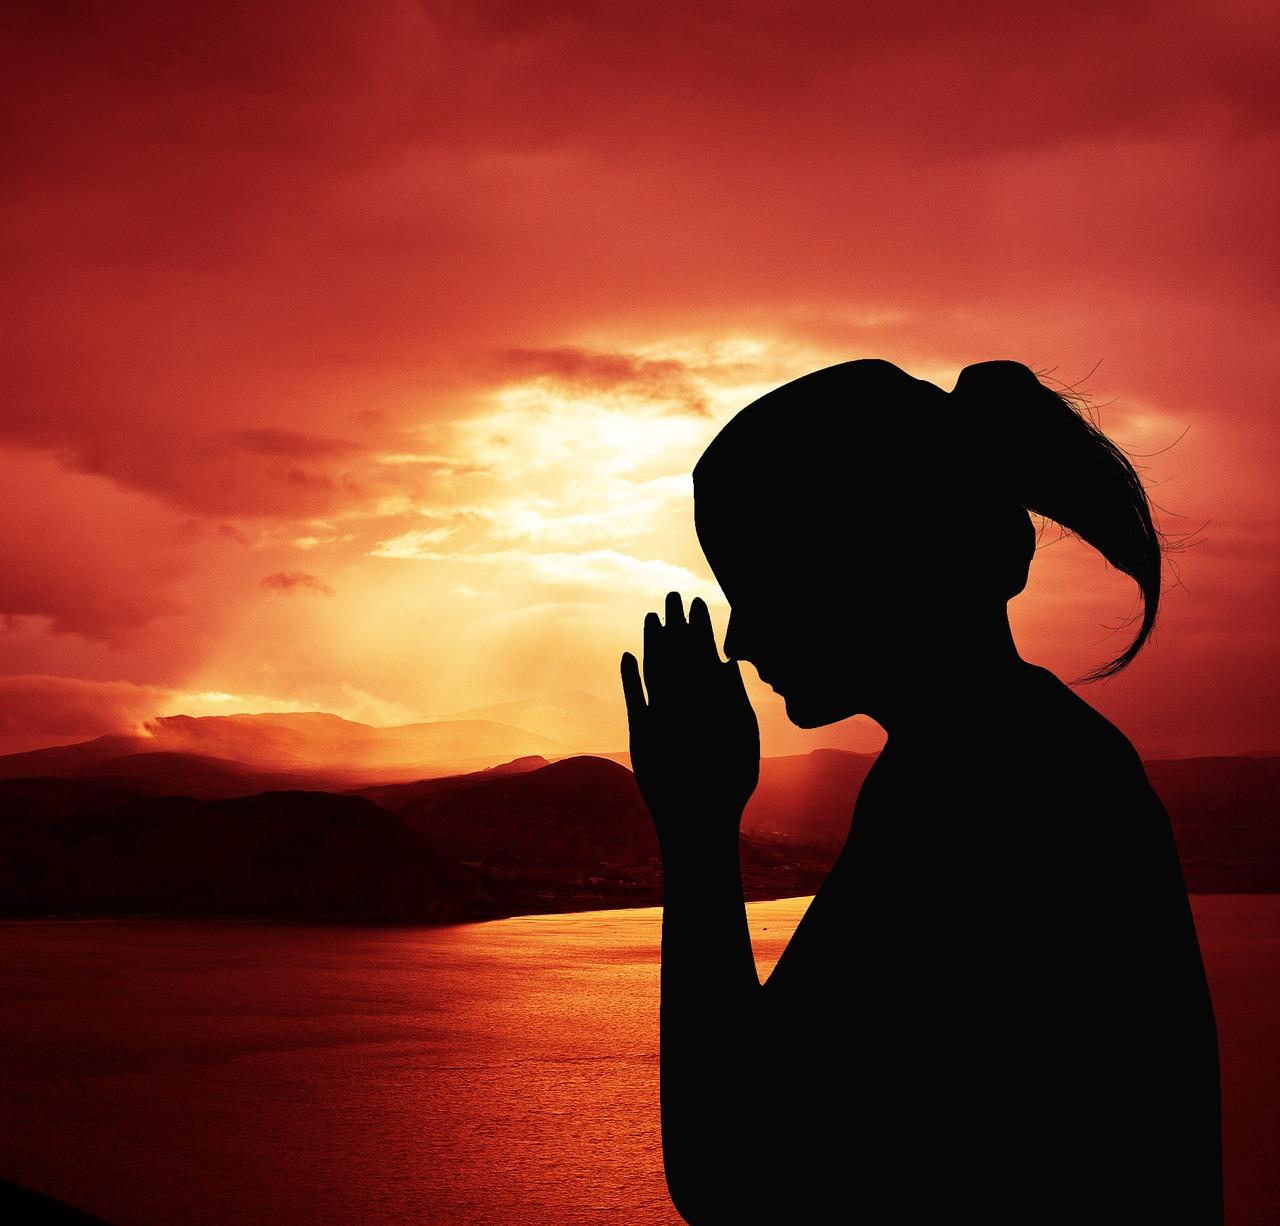 spirituality-2381114_1280.jpg